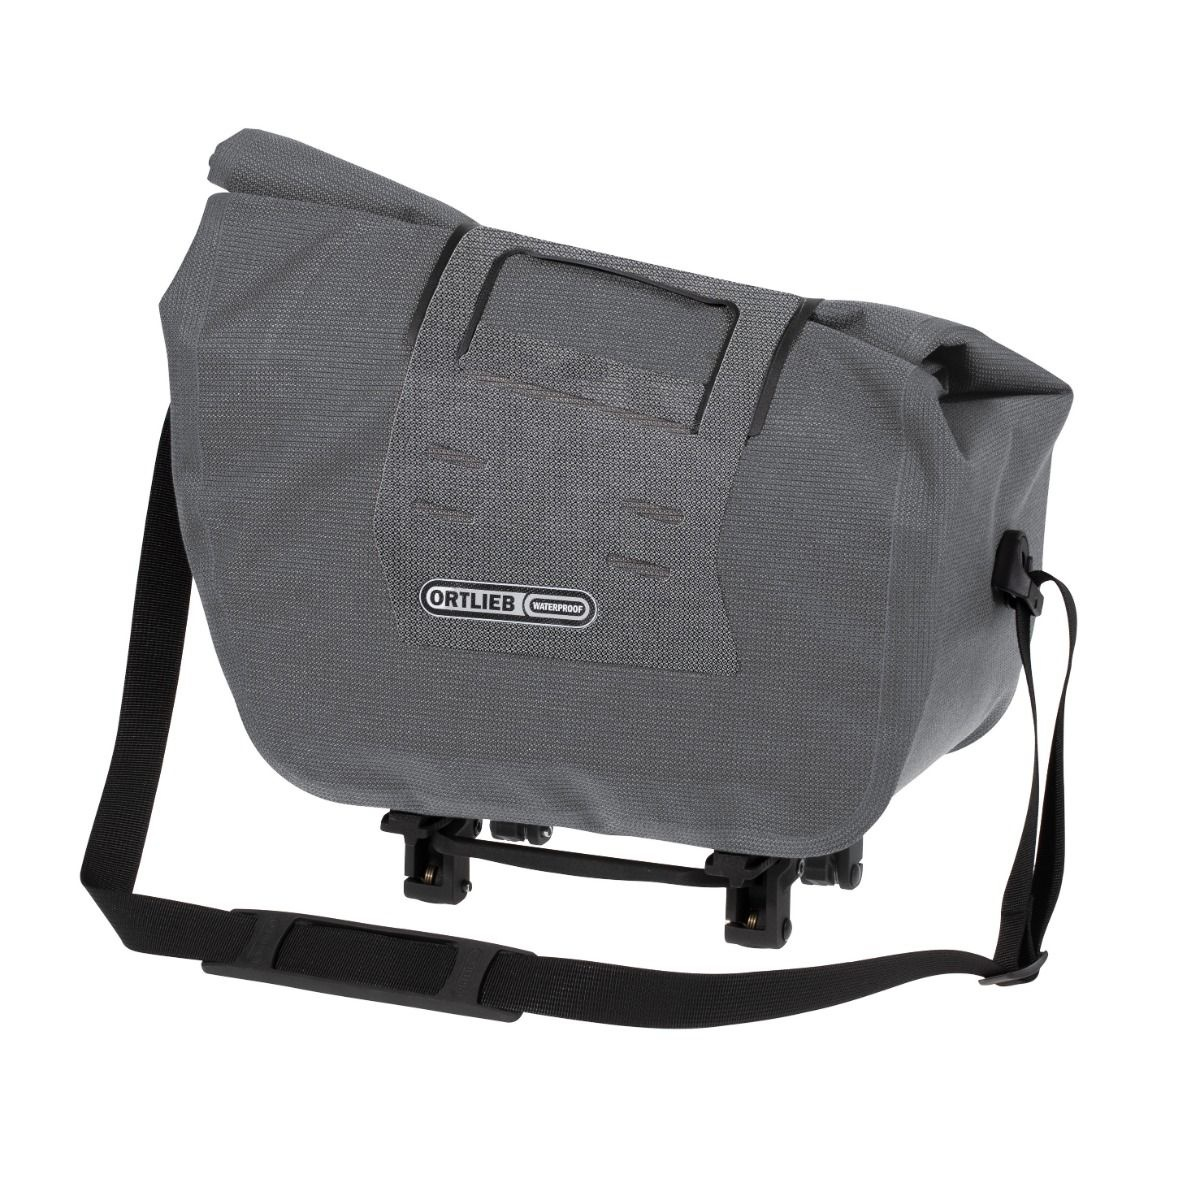 Ortlieb Trunk-Bag RC Urban Gepäckträgertasche